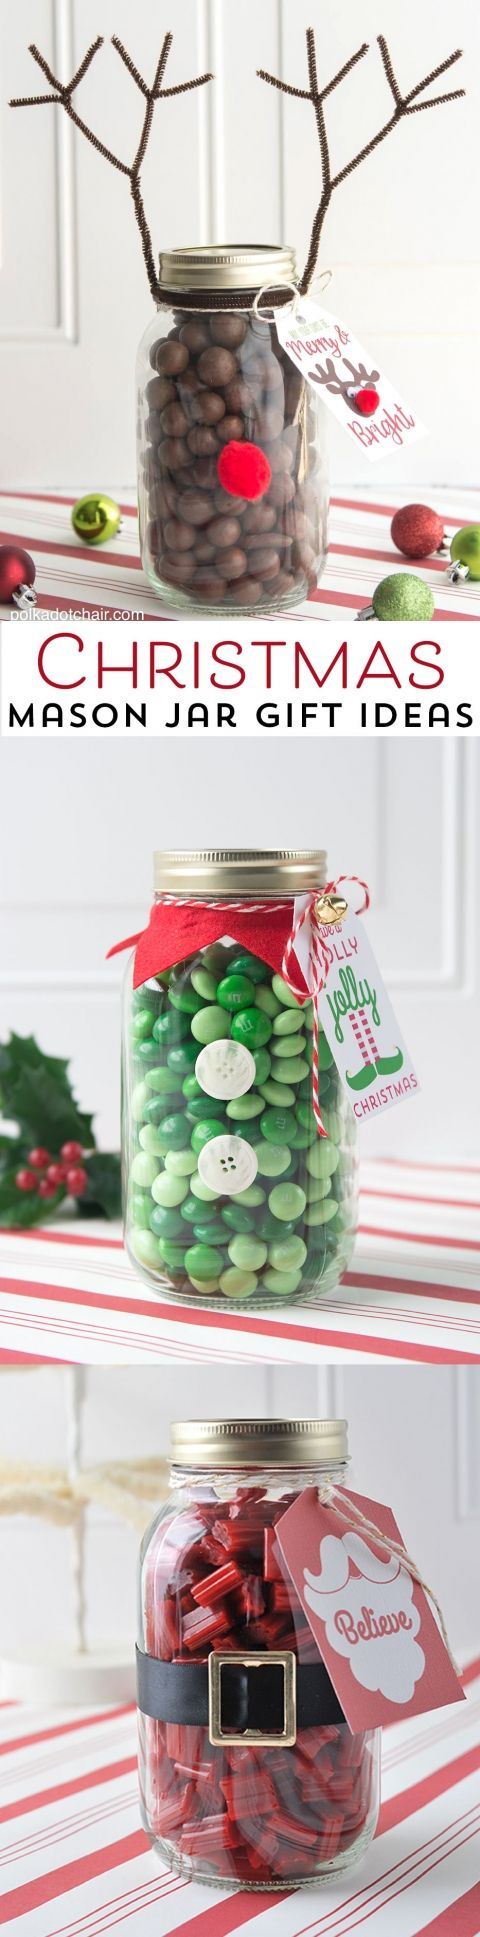 Reindeer Mason Jar Christmas Gift idea, so cute and easy. Would make a fun neighbor or teacher gift!: